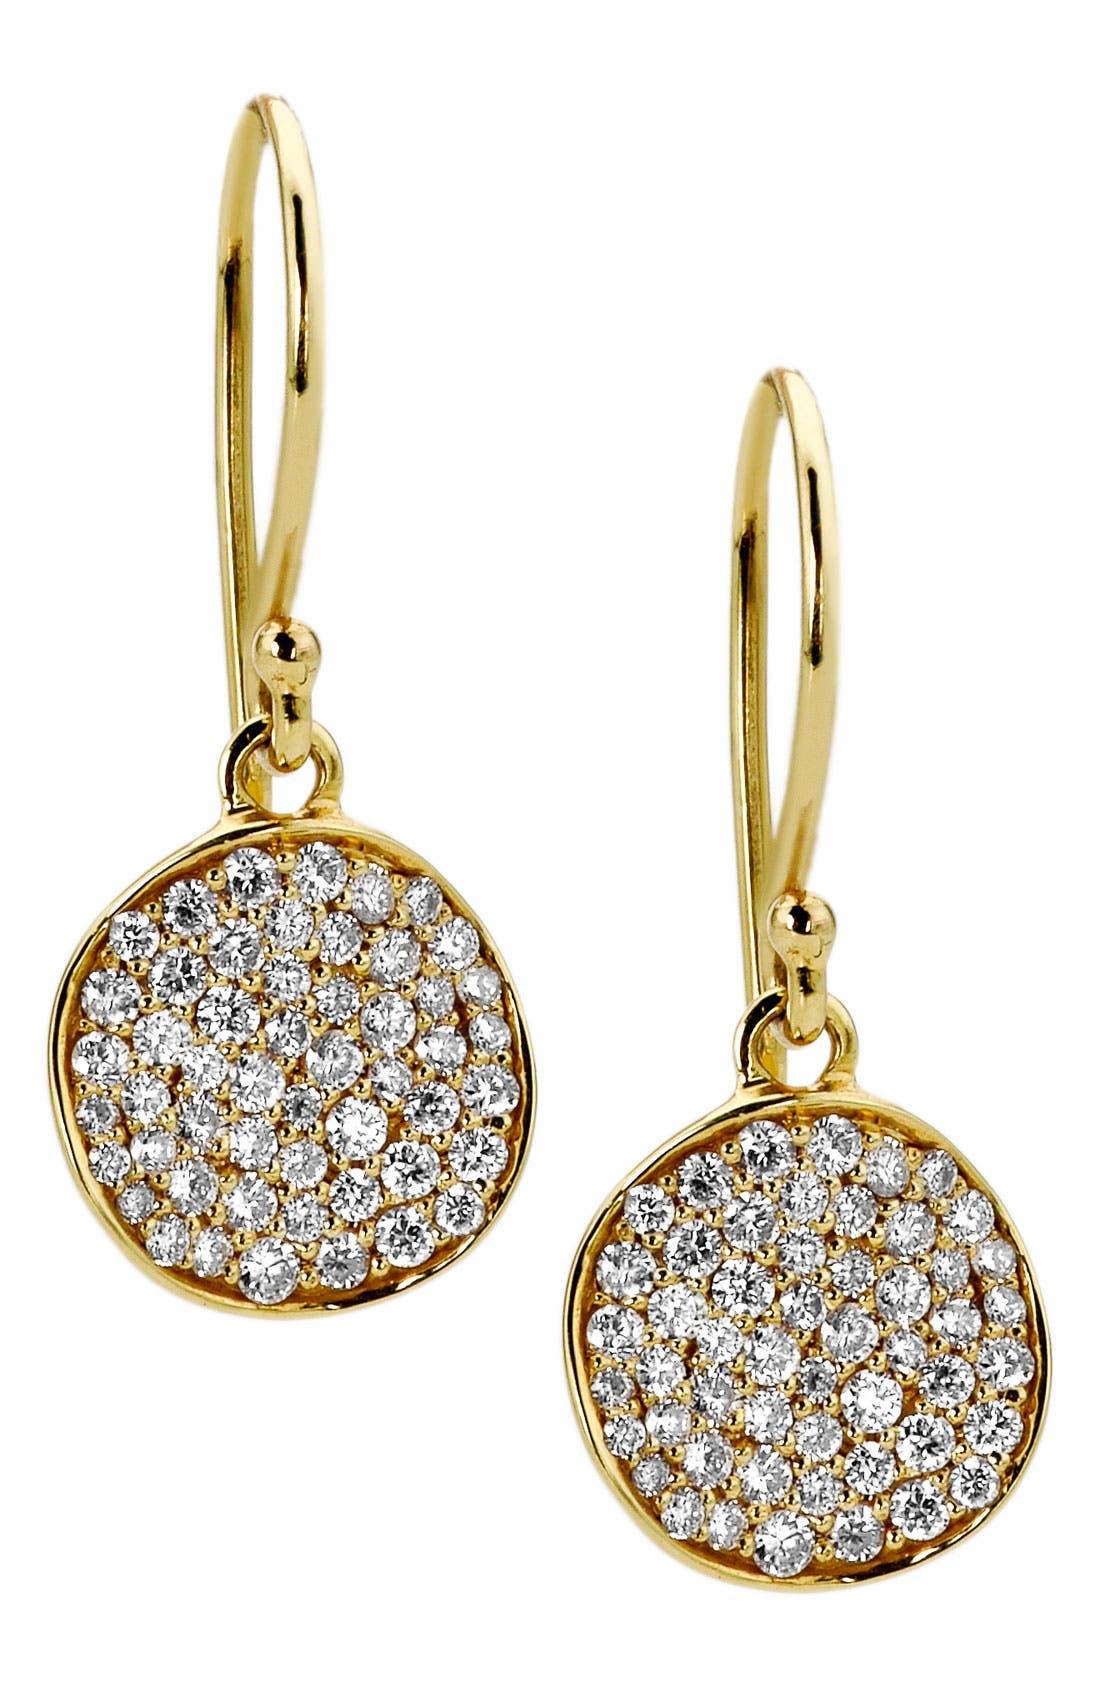 Alternate Image 1 Selected - Ippolita 'Stardust - Mini Flower' 18k Gold Drop Earrings